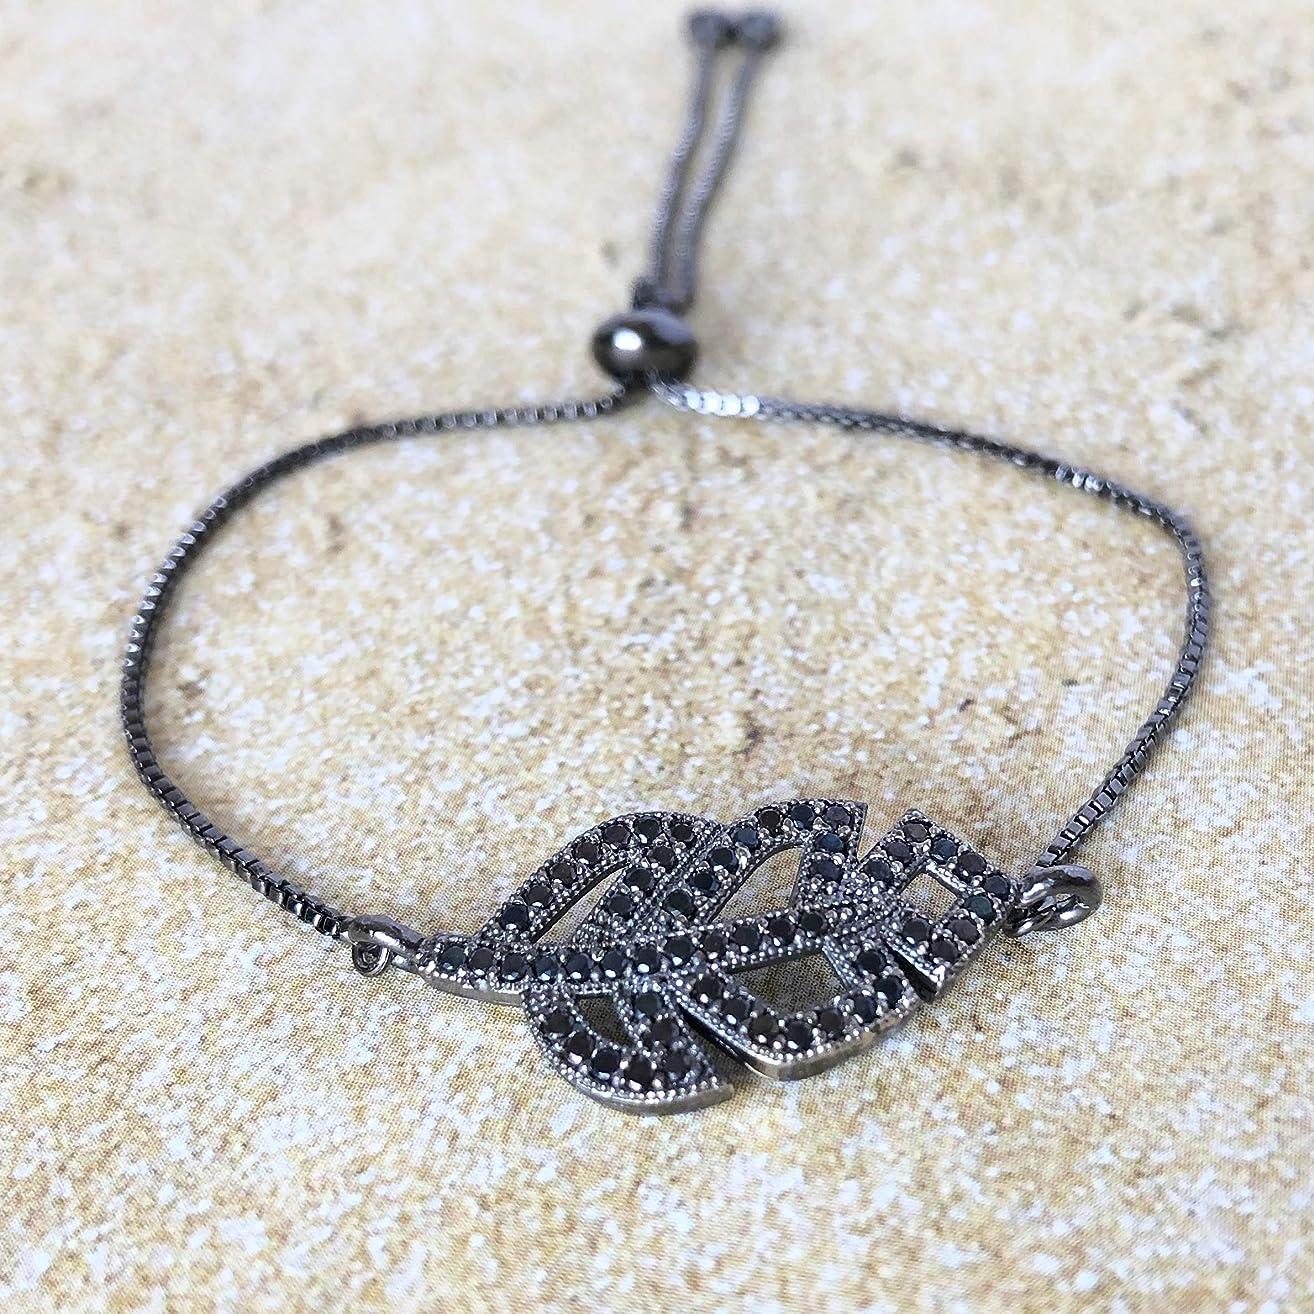 Adjustable CZ Leaf Charm Bracelet for Women Girls - Nature Inspired Jewelry - Nature Lovers Gift - Bolo Bracelets Sliding Clasp